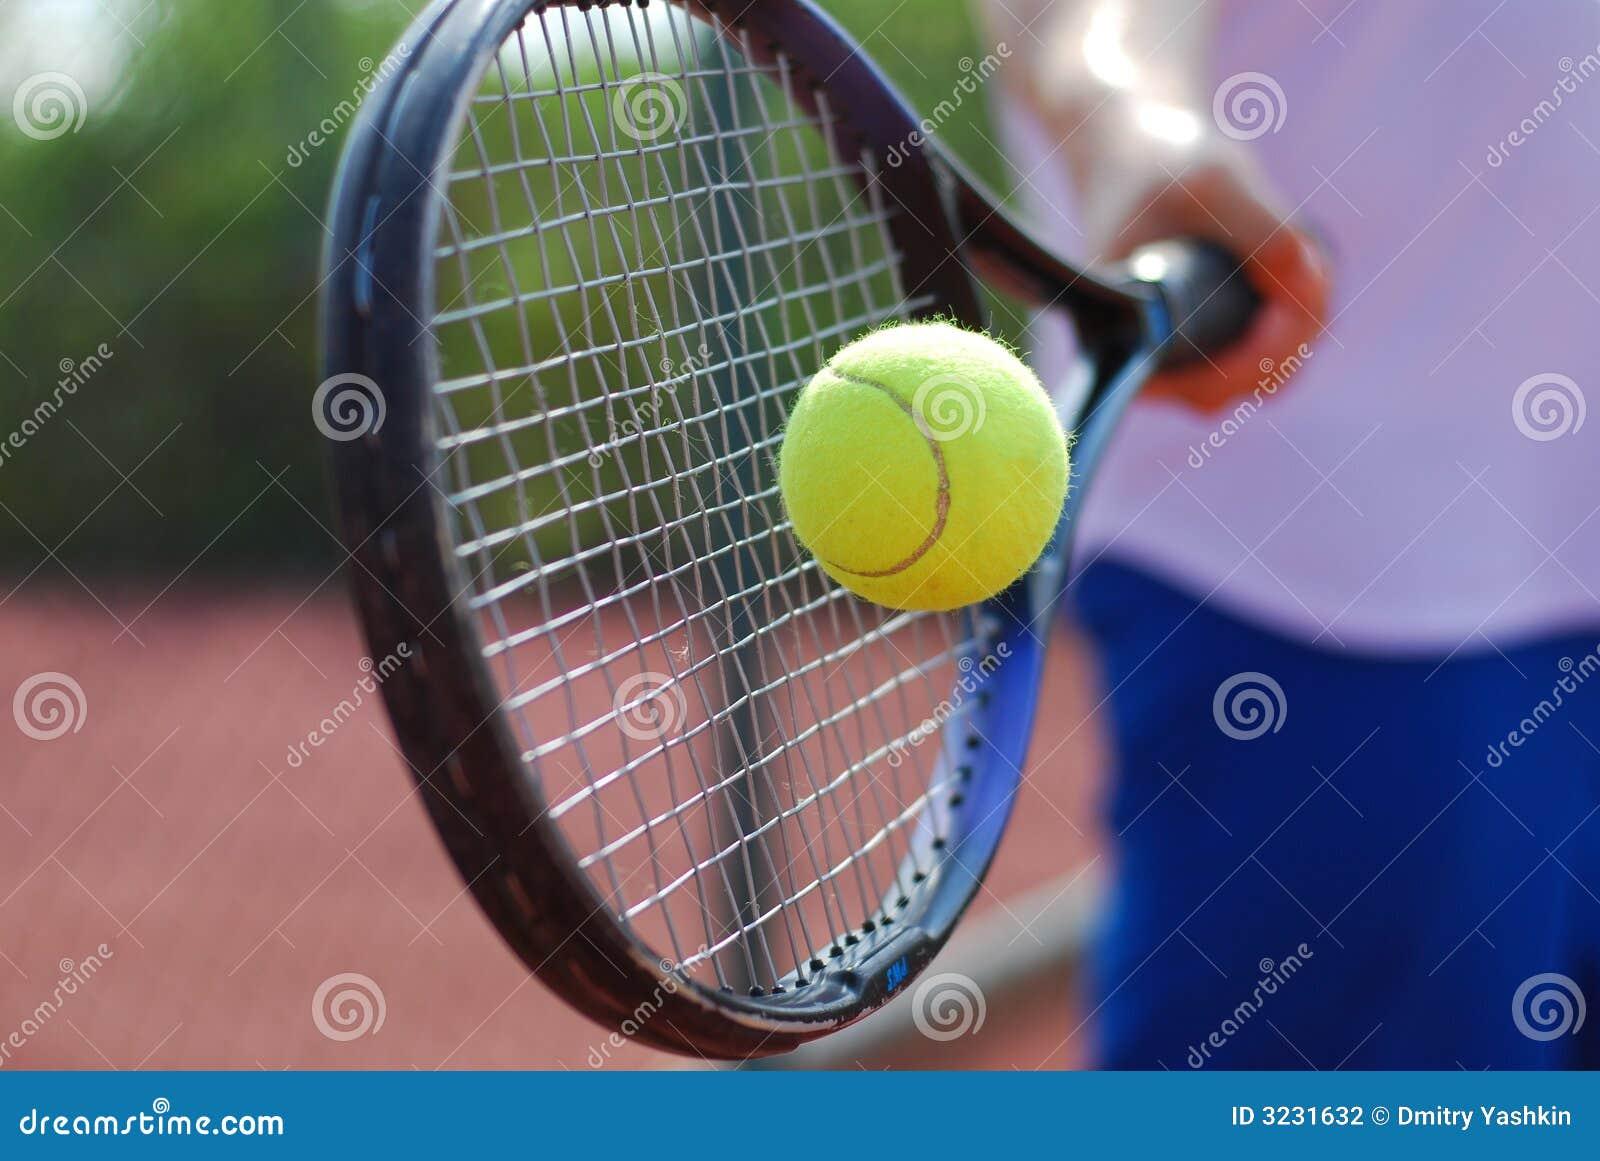 Raquete e esfera de tênis